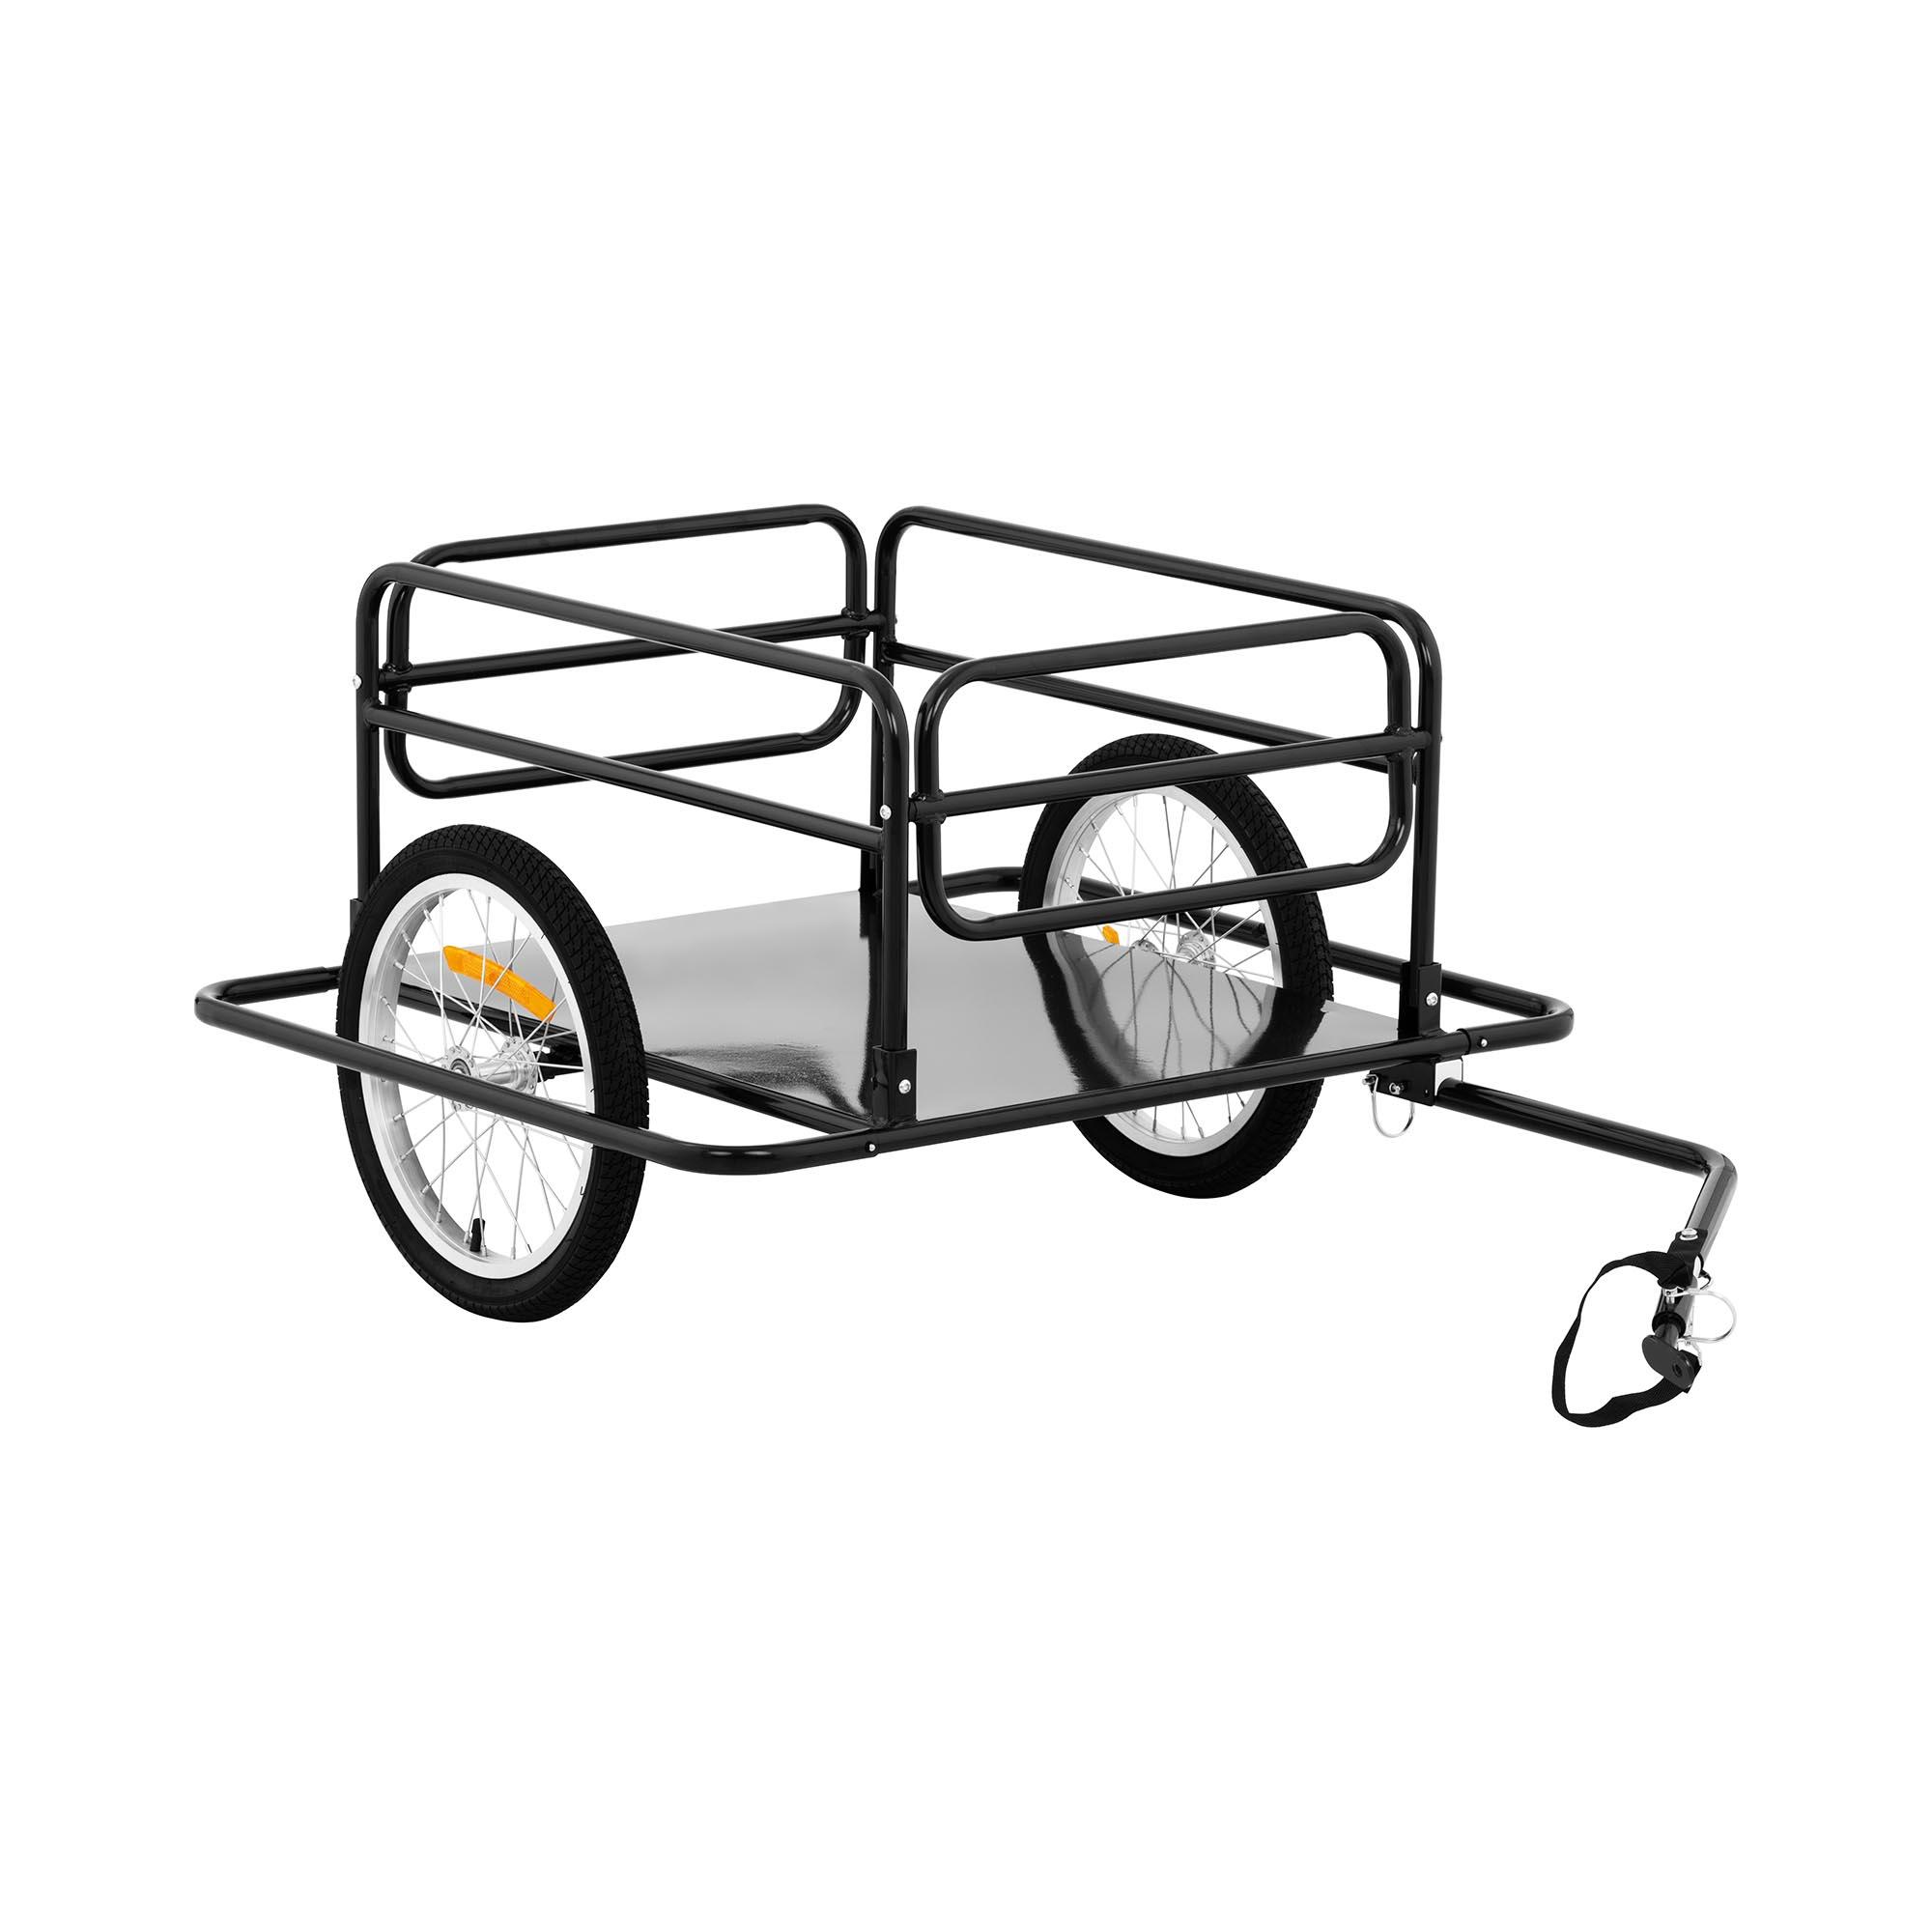 Uniprodo Fahrrad Lastenanhänger - 50 kg - Speichenreflektoren UNI_TRAILER_07